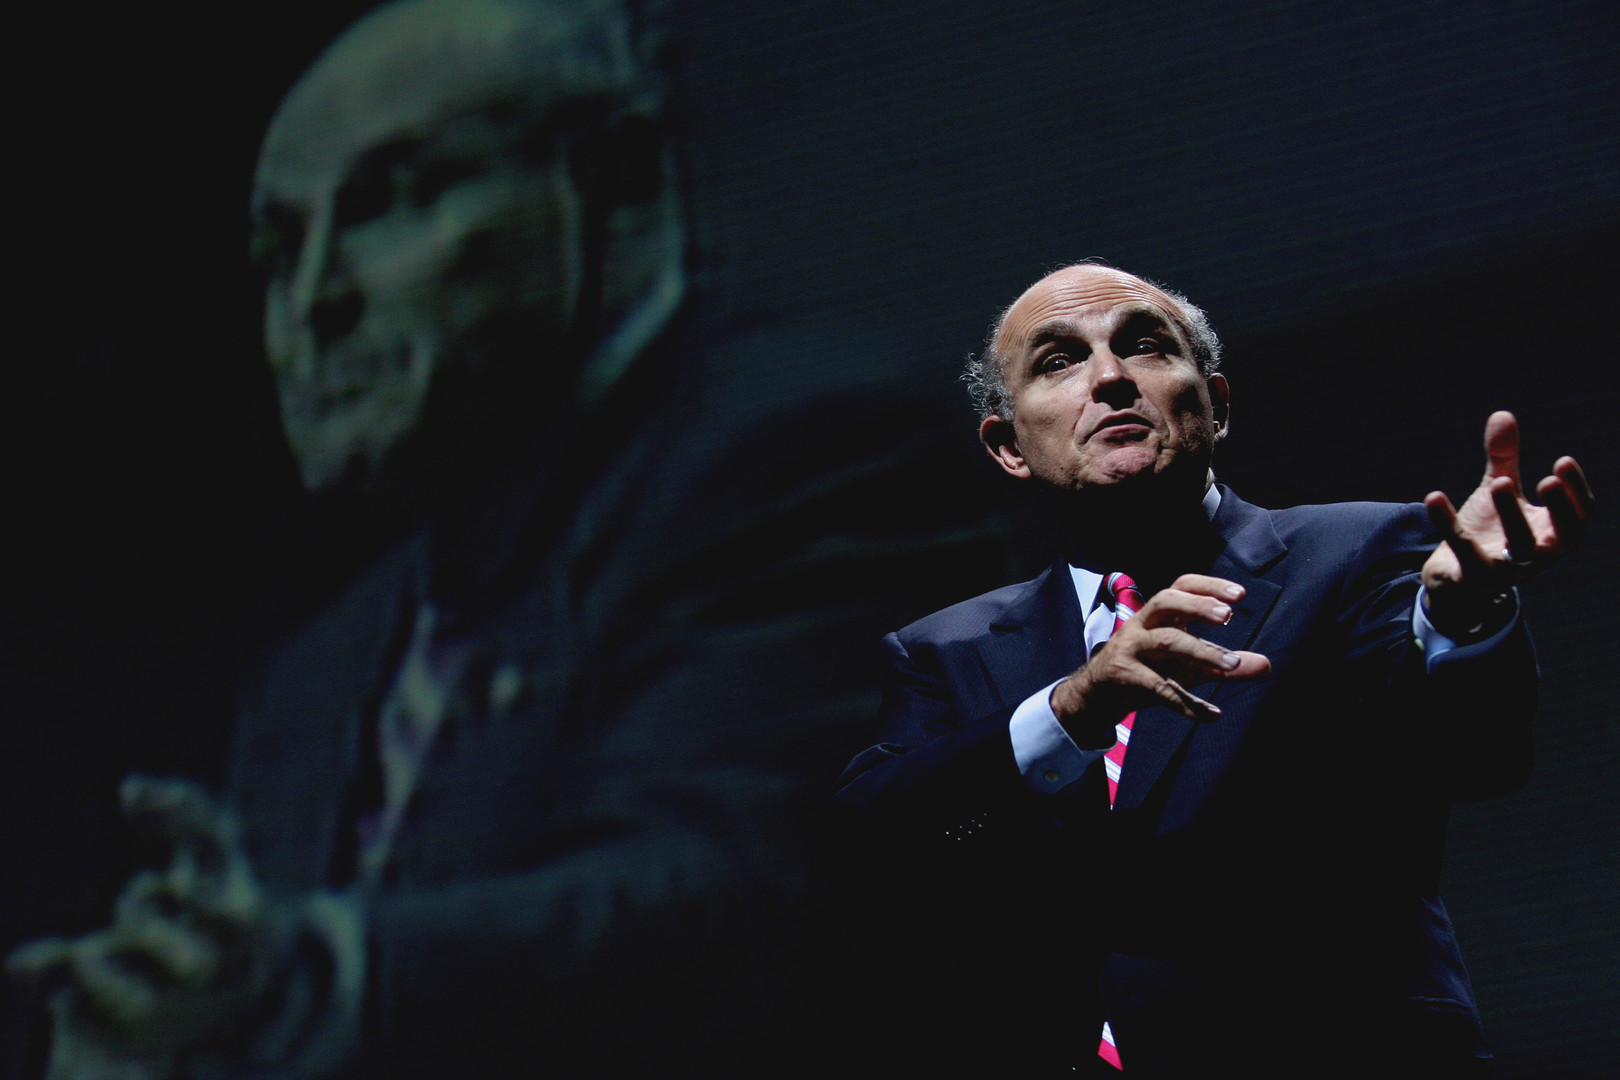 Rudolph Giuliani,Mayor of New York City